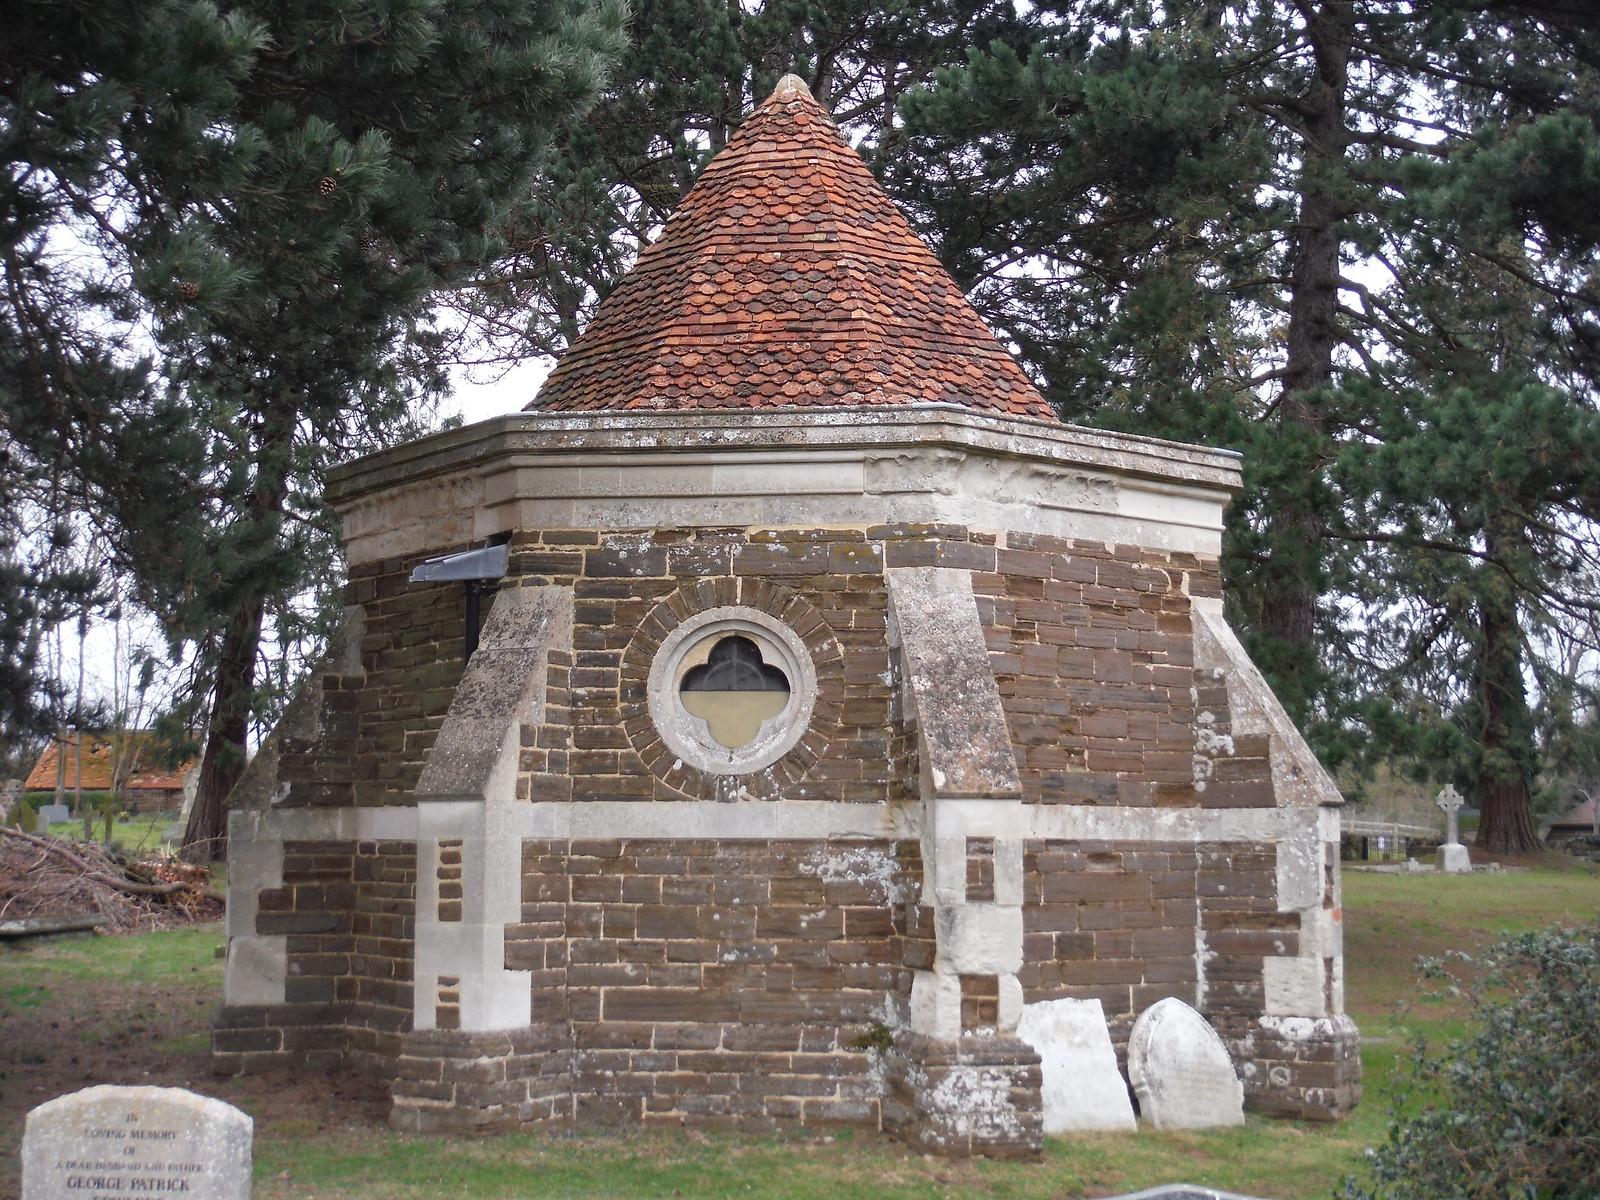 Ailesbury Mausoleum & Crypt, Maulden SWC Walk 231 Flitwick Circular